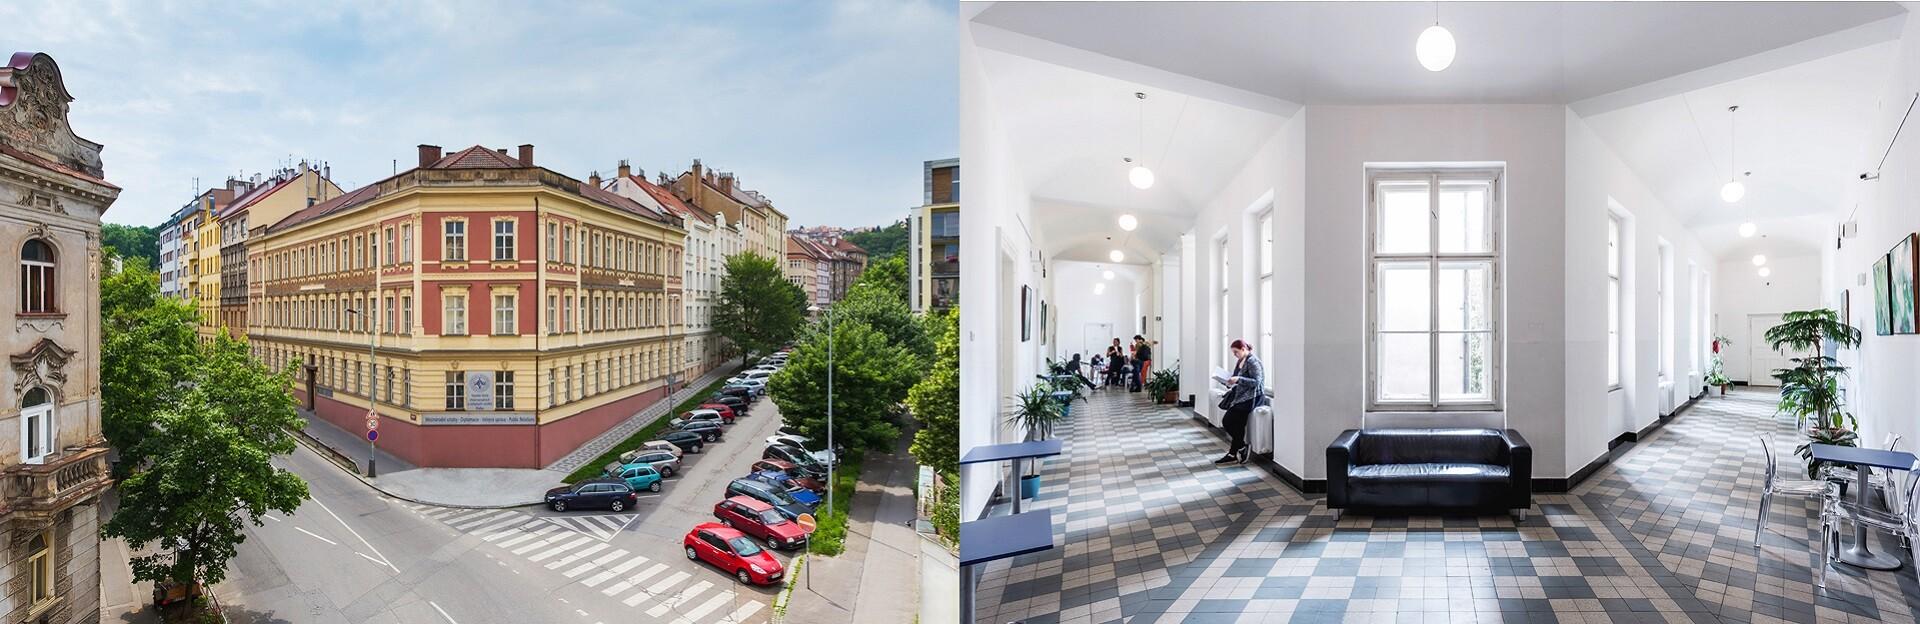 College of International and Public Relations Prague (VSMVV)